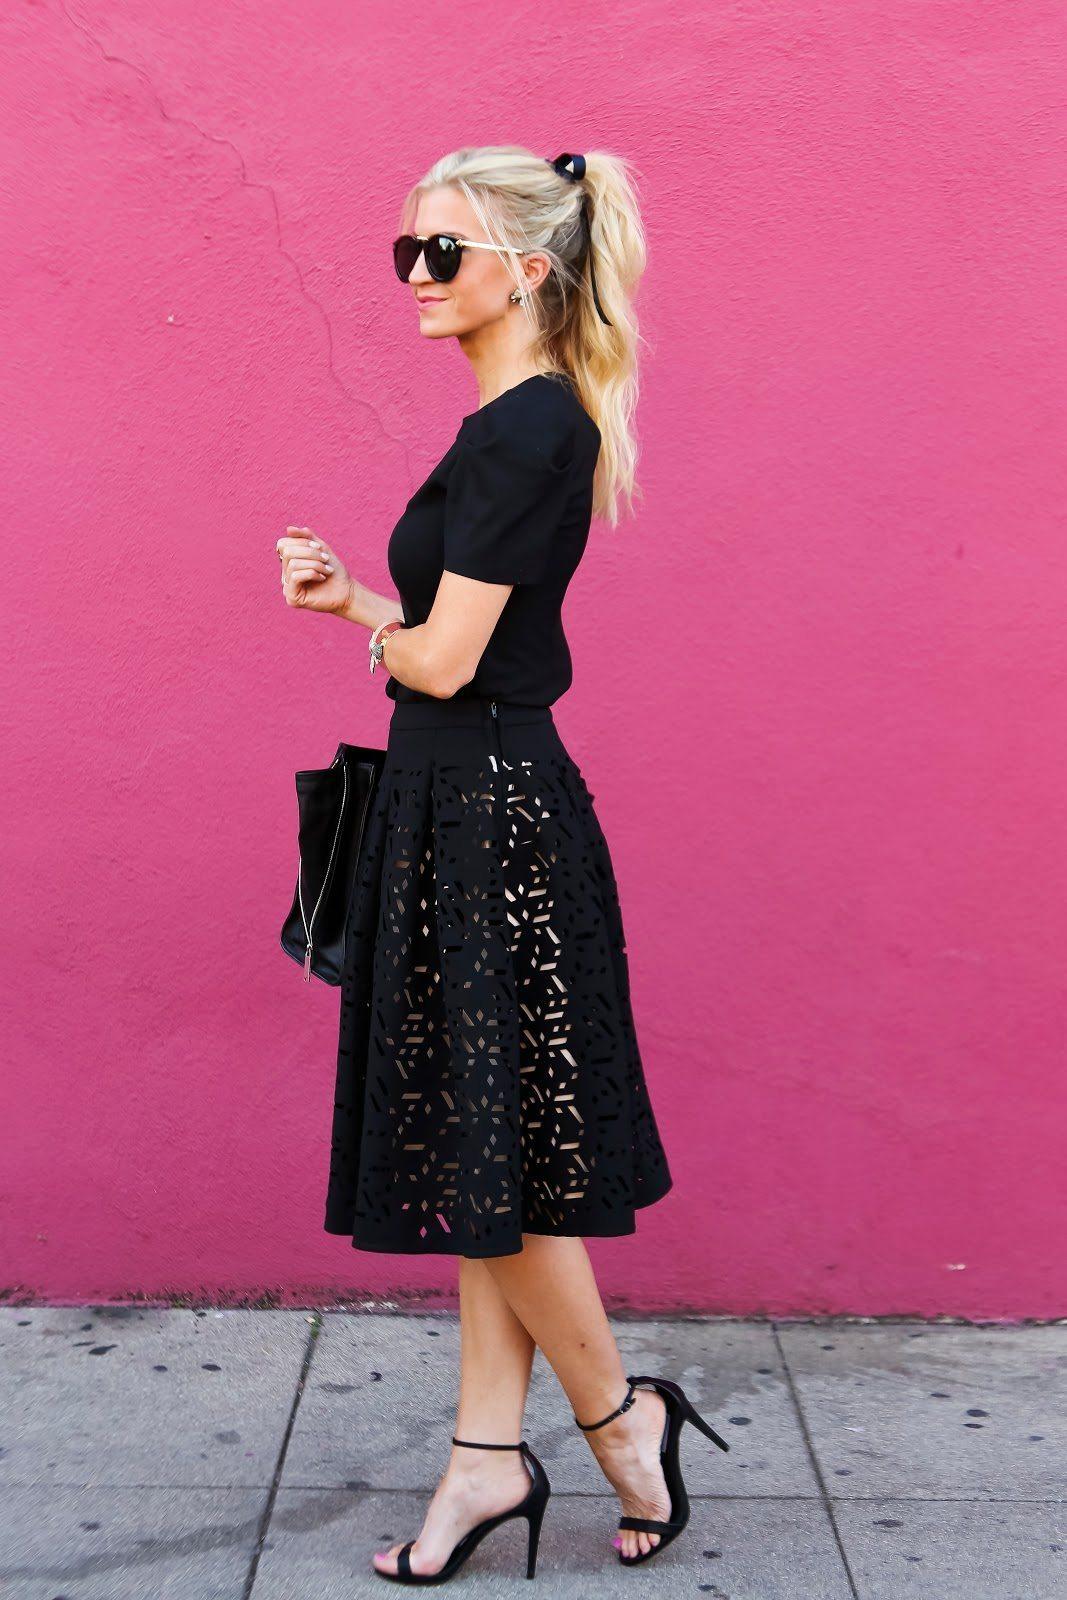 Think Pink Elle Apparel By Leanne Barlow